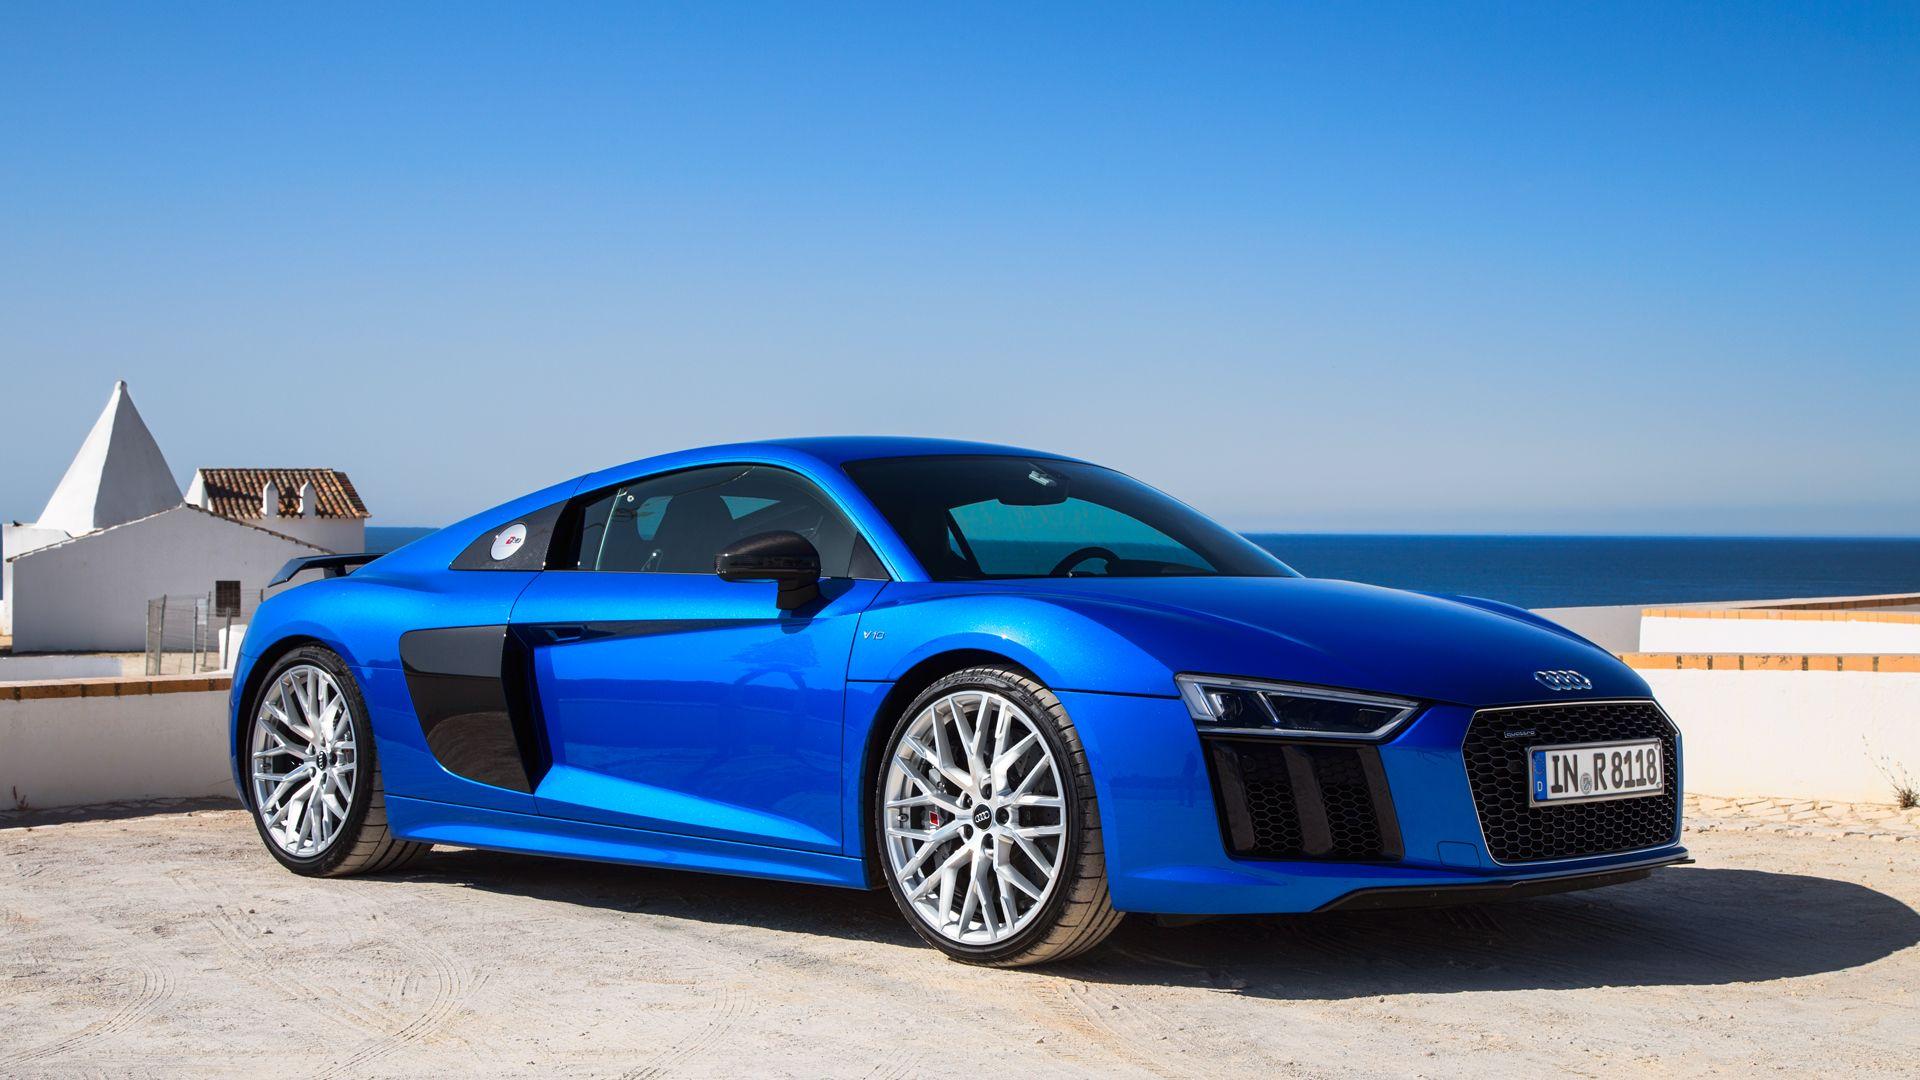 Audi R8 Spyder V10 Plus Wallpapers High Definition Audi R8